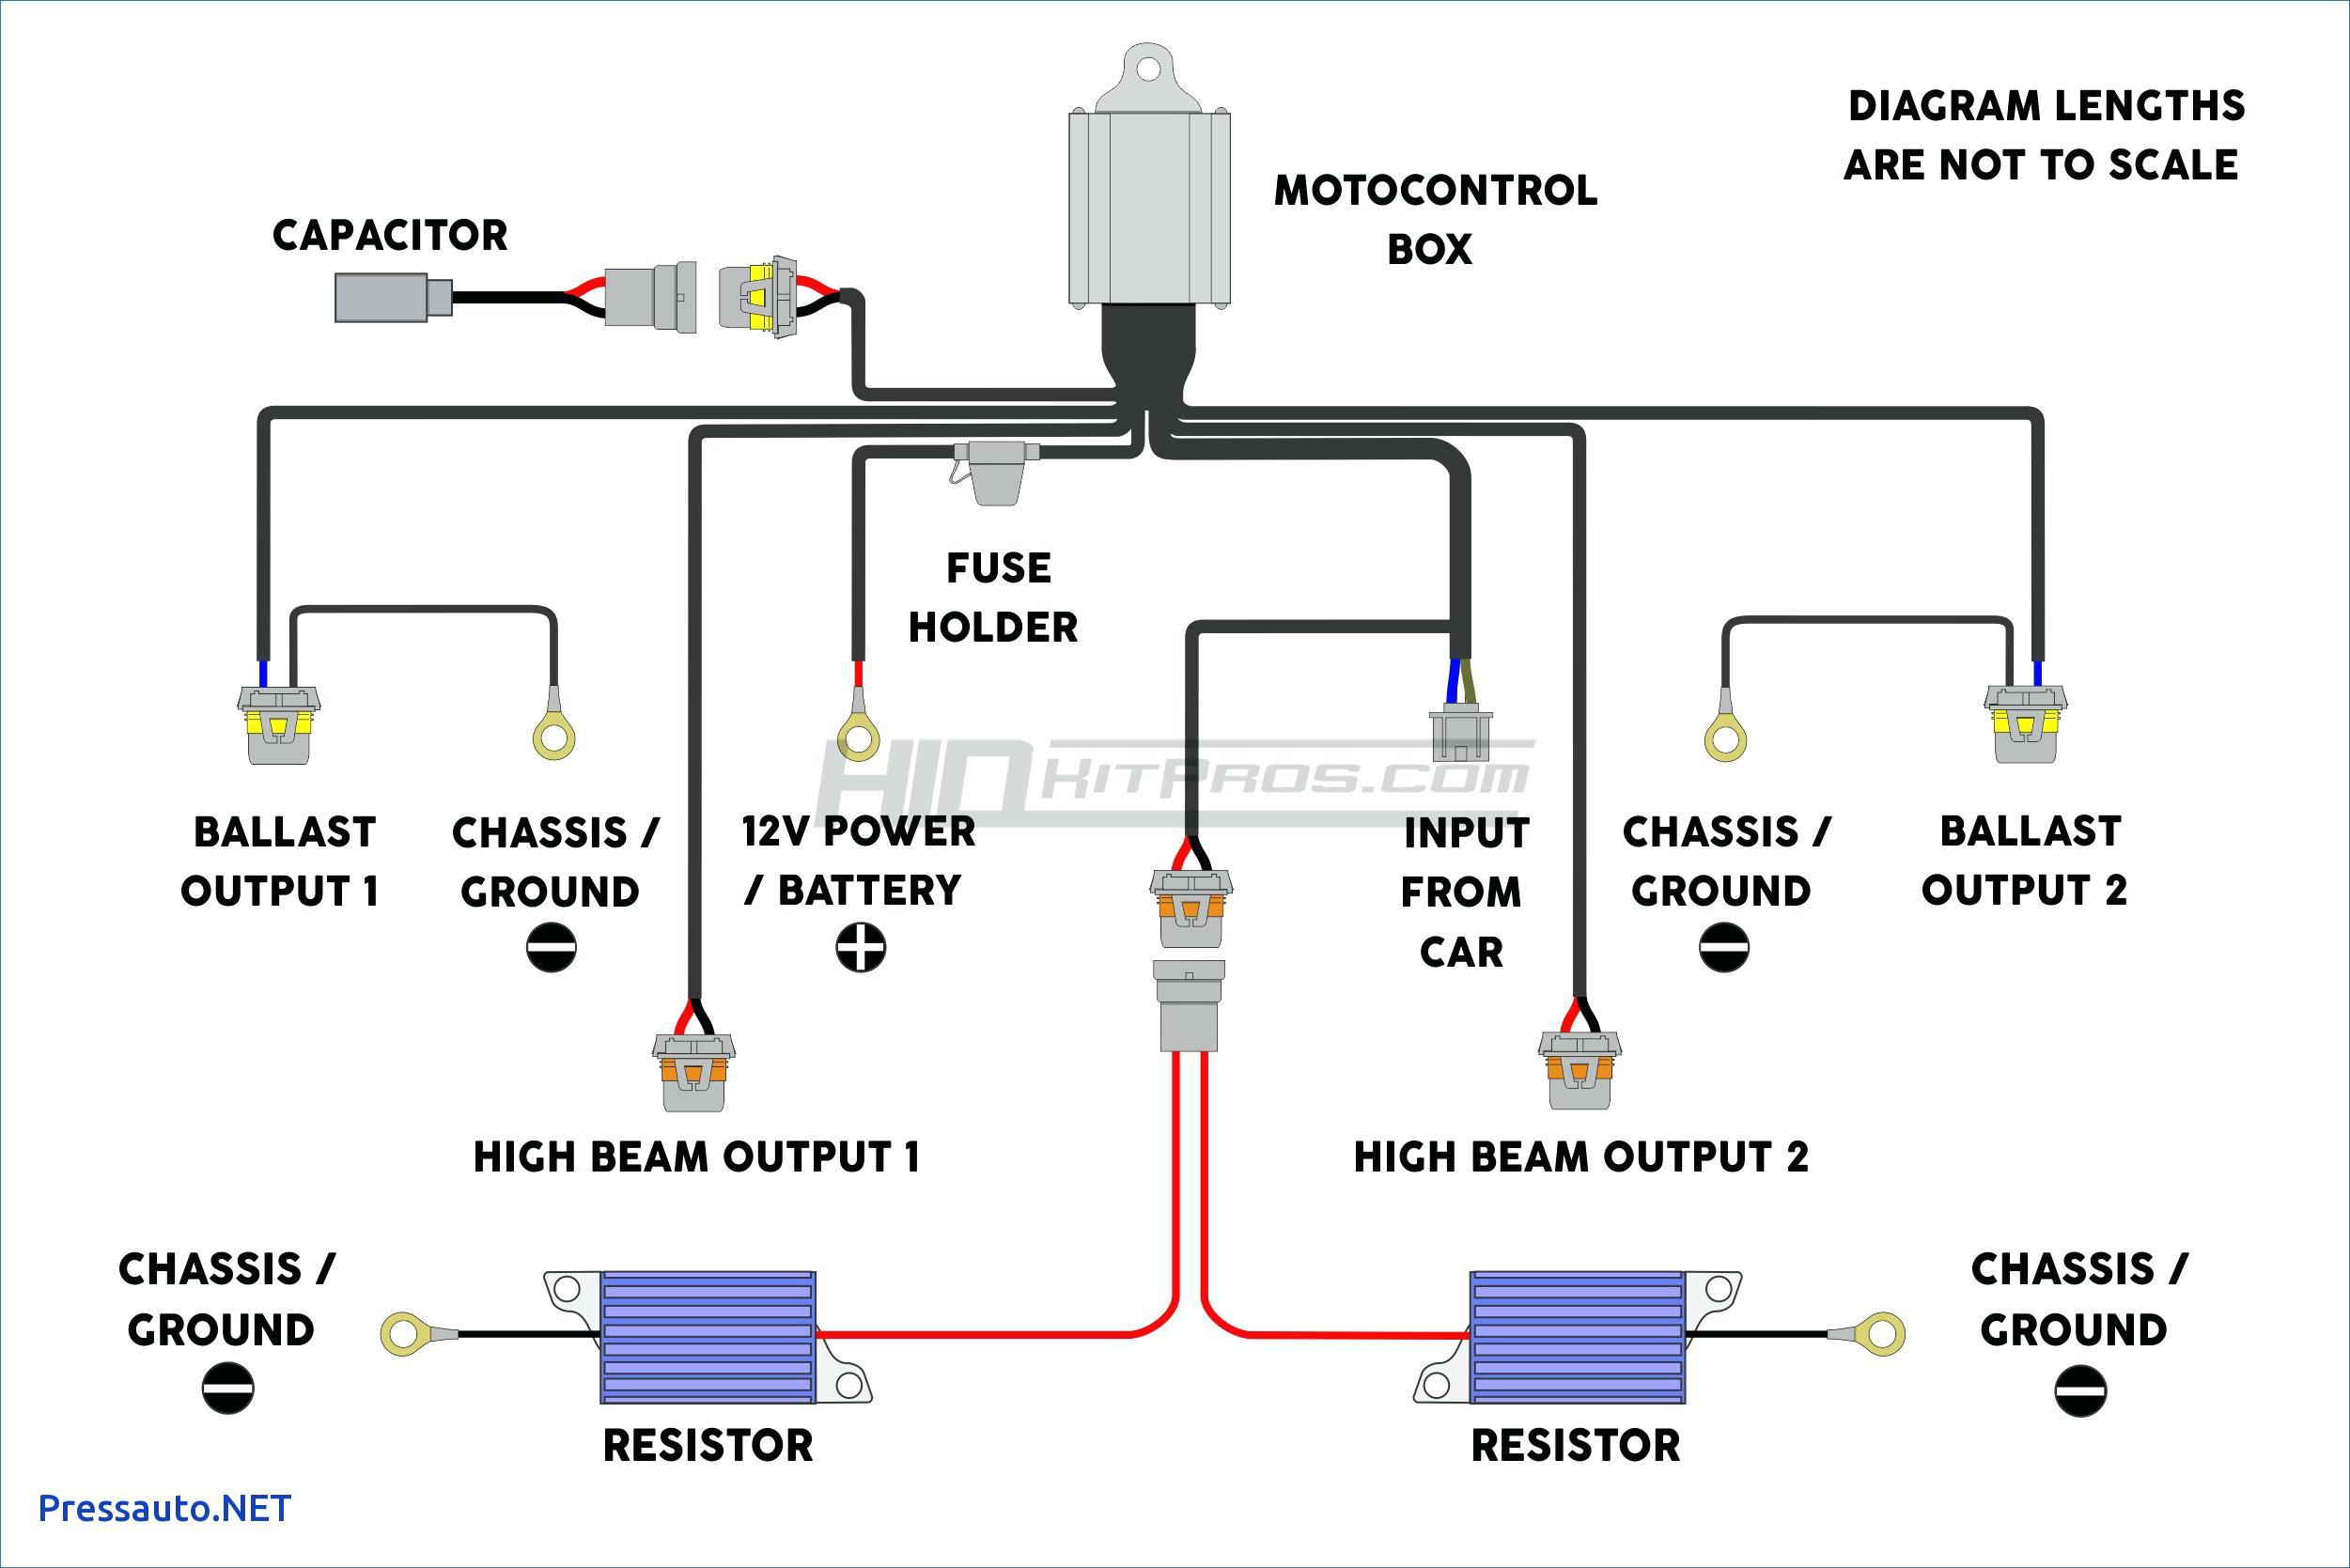 Meyer Plow Pump Wiring Diagram | Manual E-Books - Meyer E47 Wiring Diagram